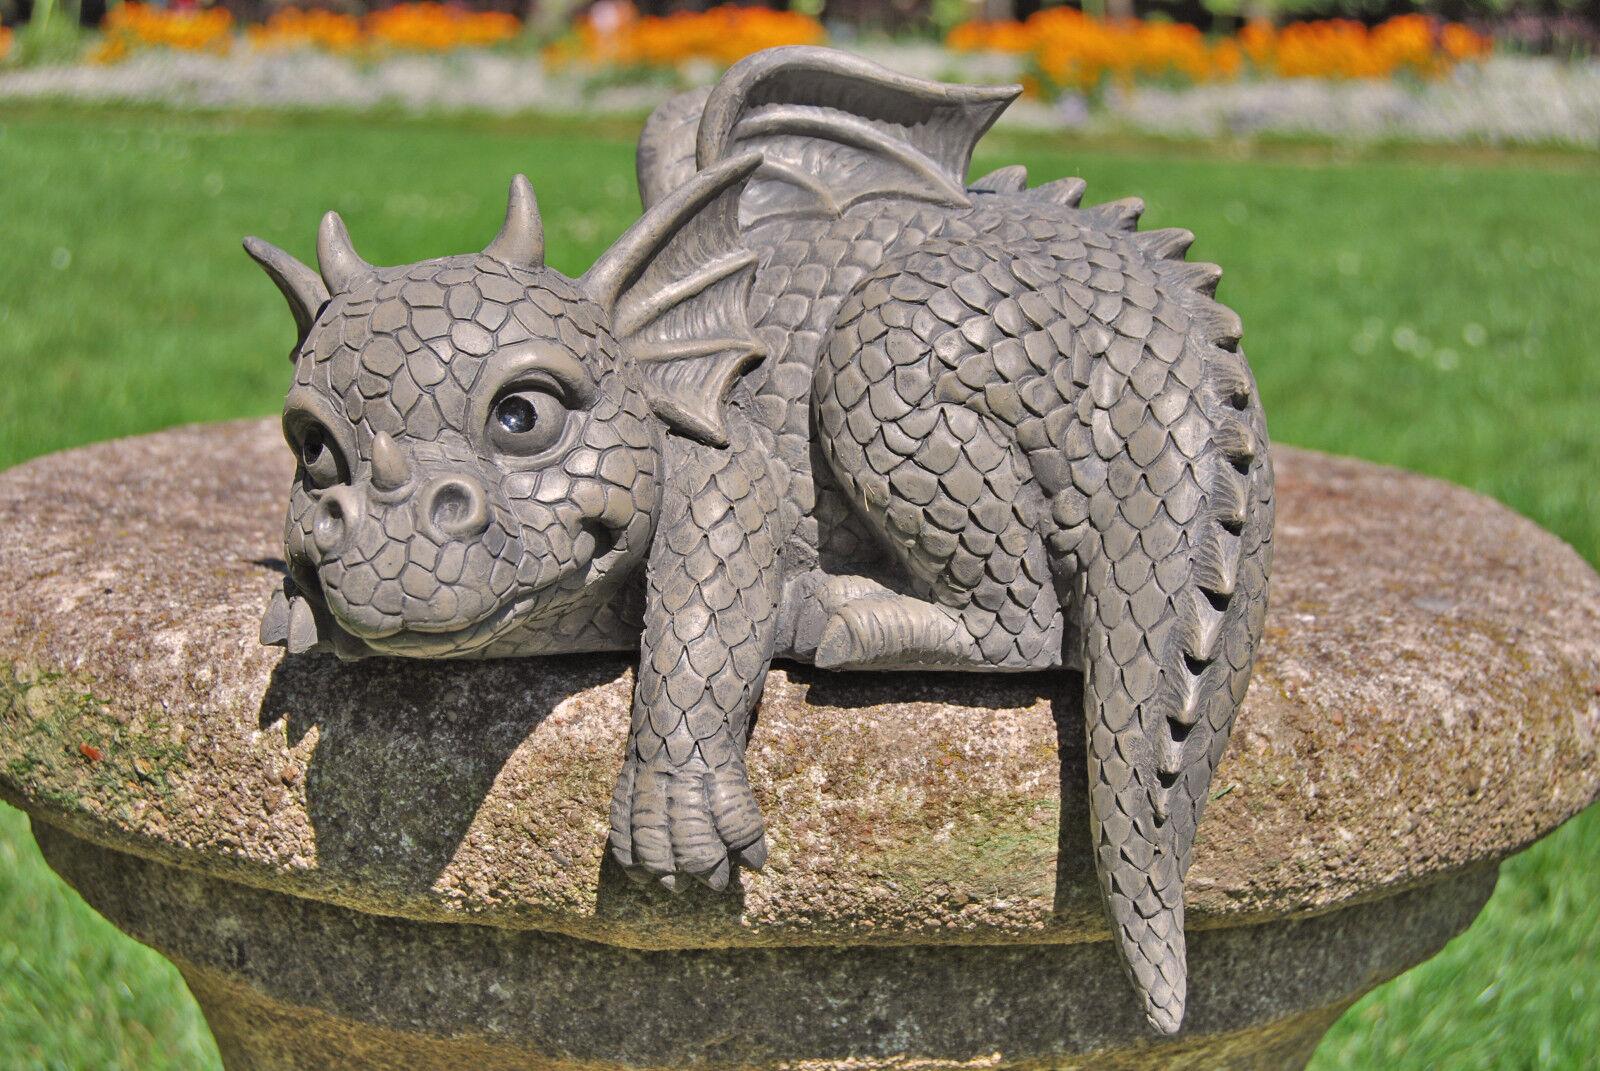 Drachen figuren garten test vergleich drachen figuren for Gartendeko figuren gunstig